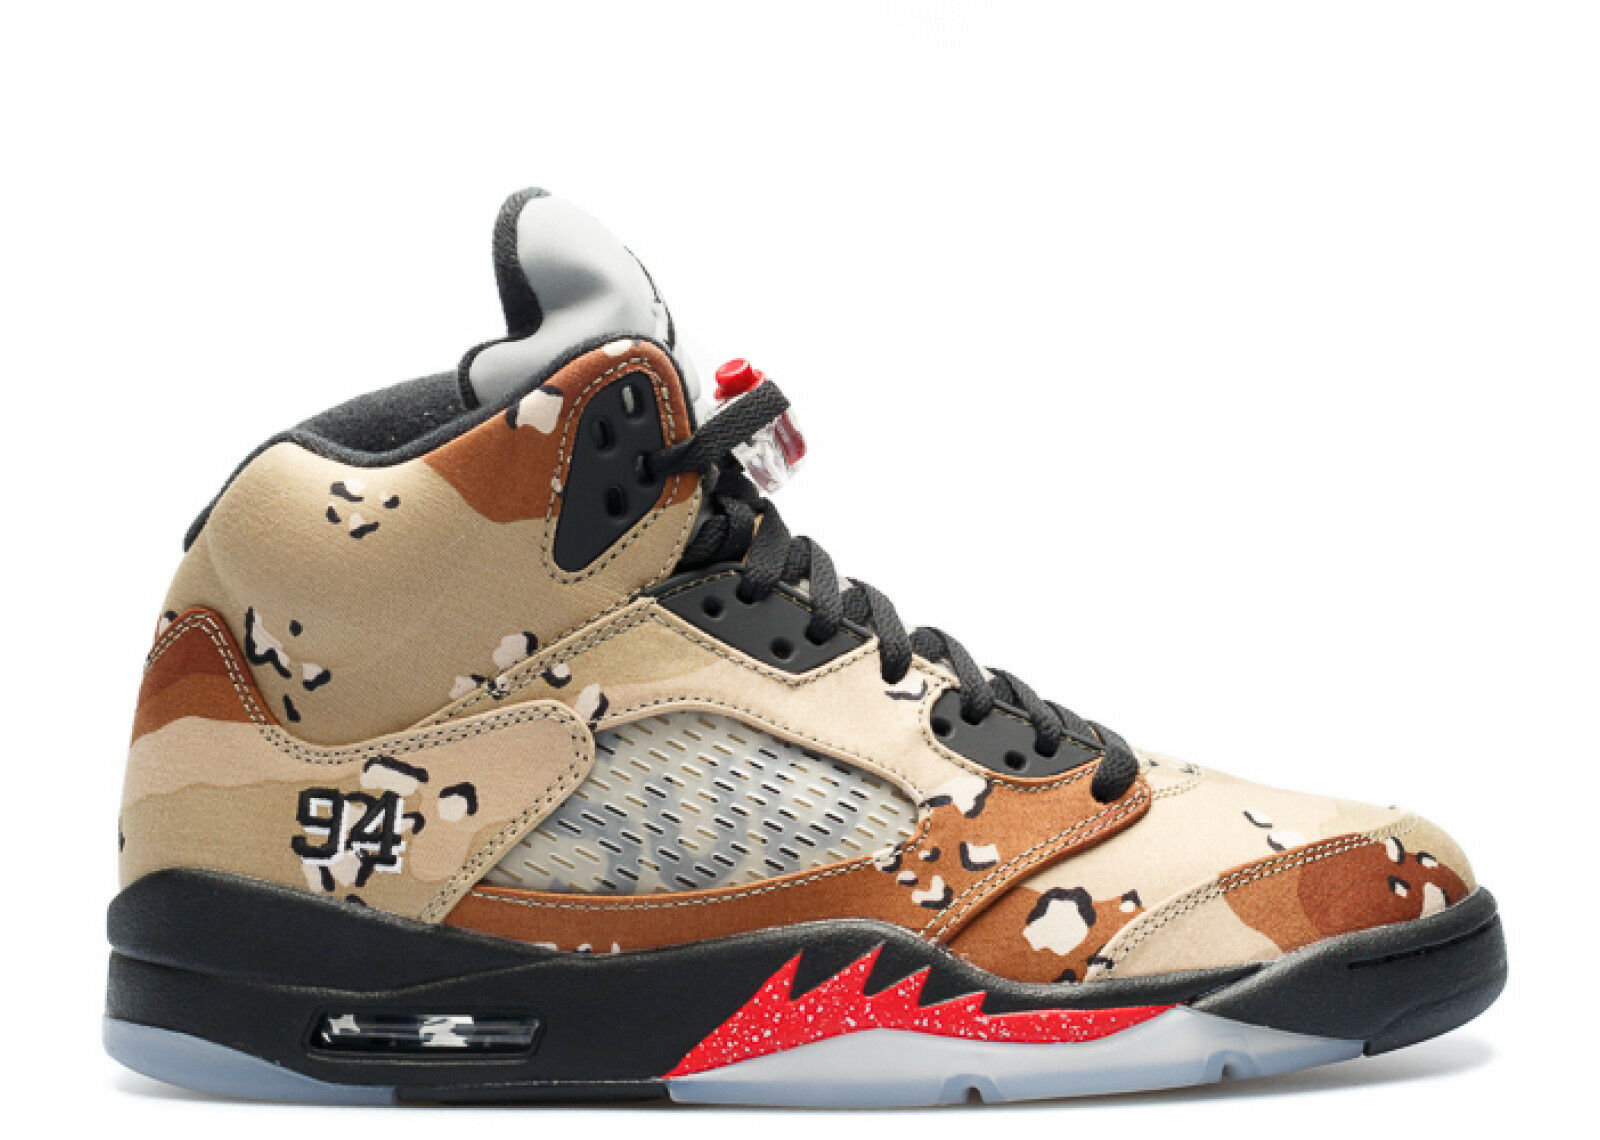 ddbaedc9f6 Supreme X Nike Air Jordan 5 V Retro Desert Camo Size 13. 824371-201 ...